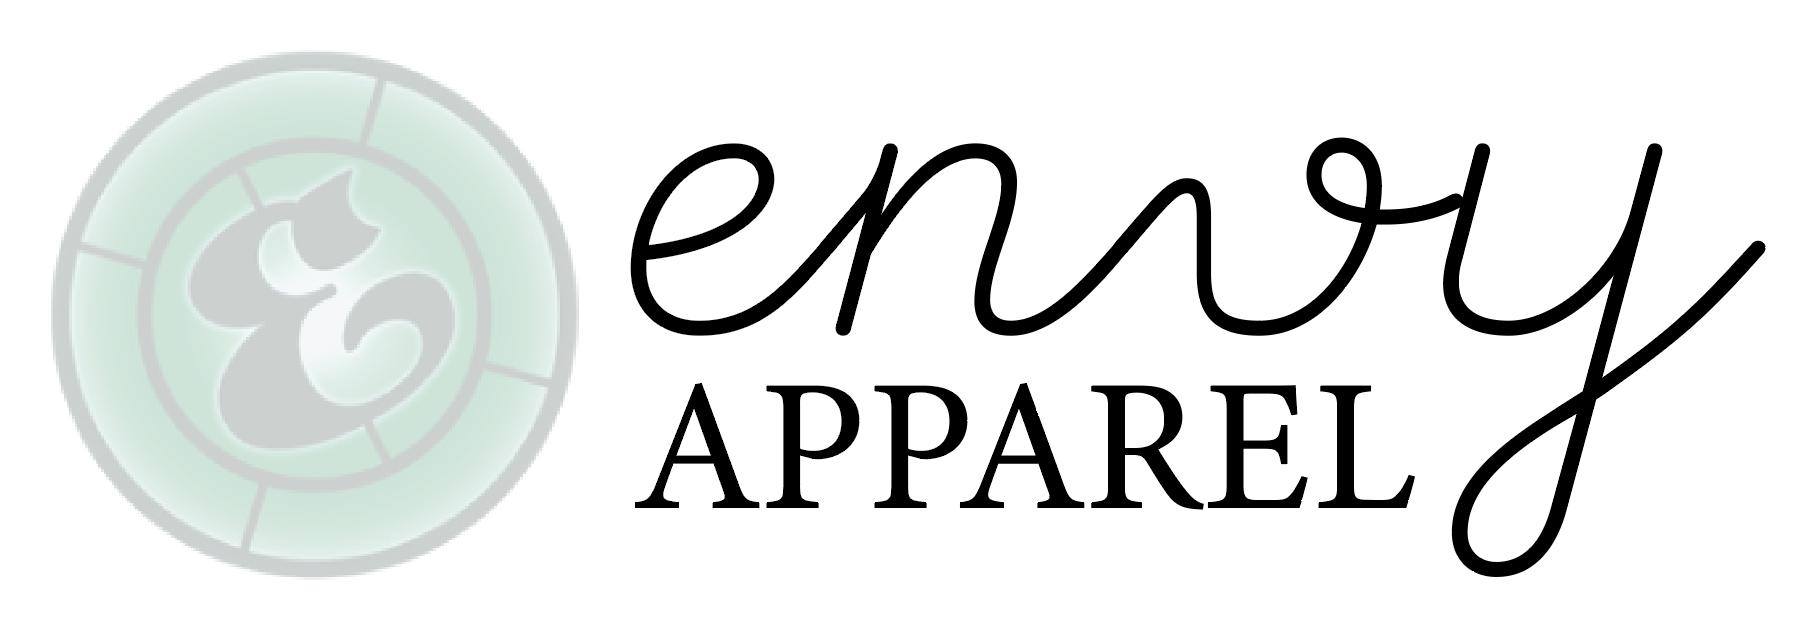 Envy Apparel